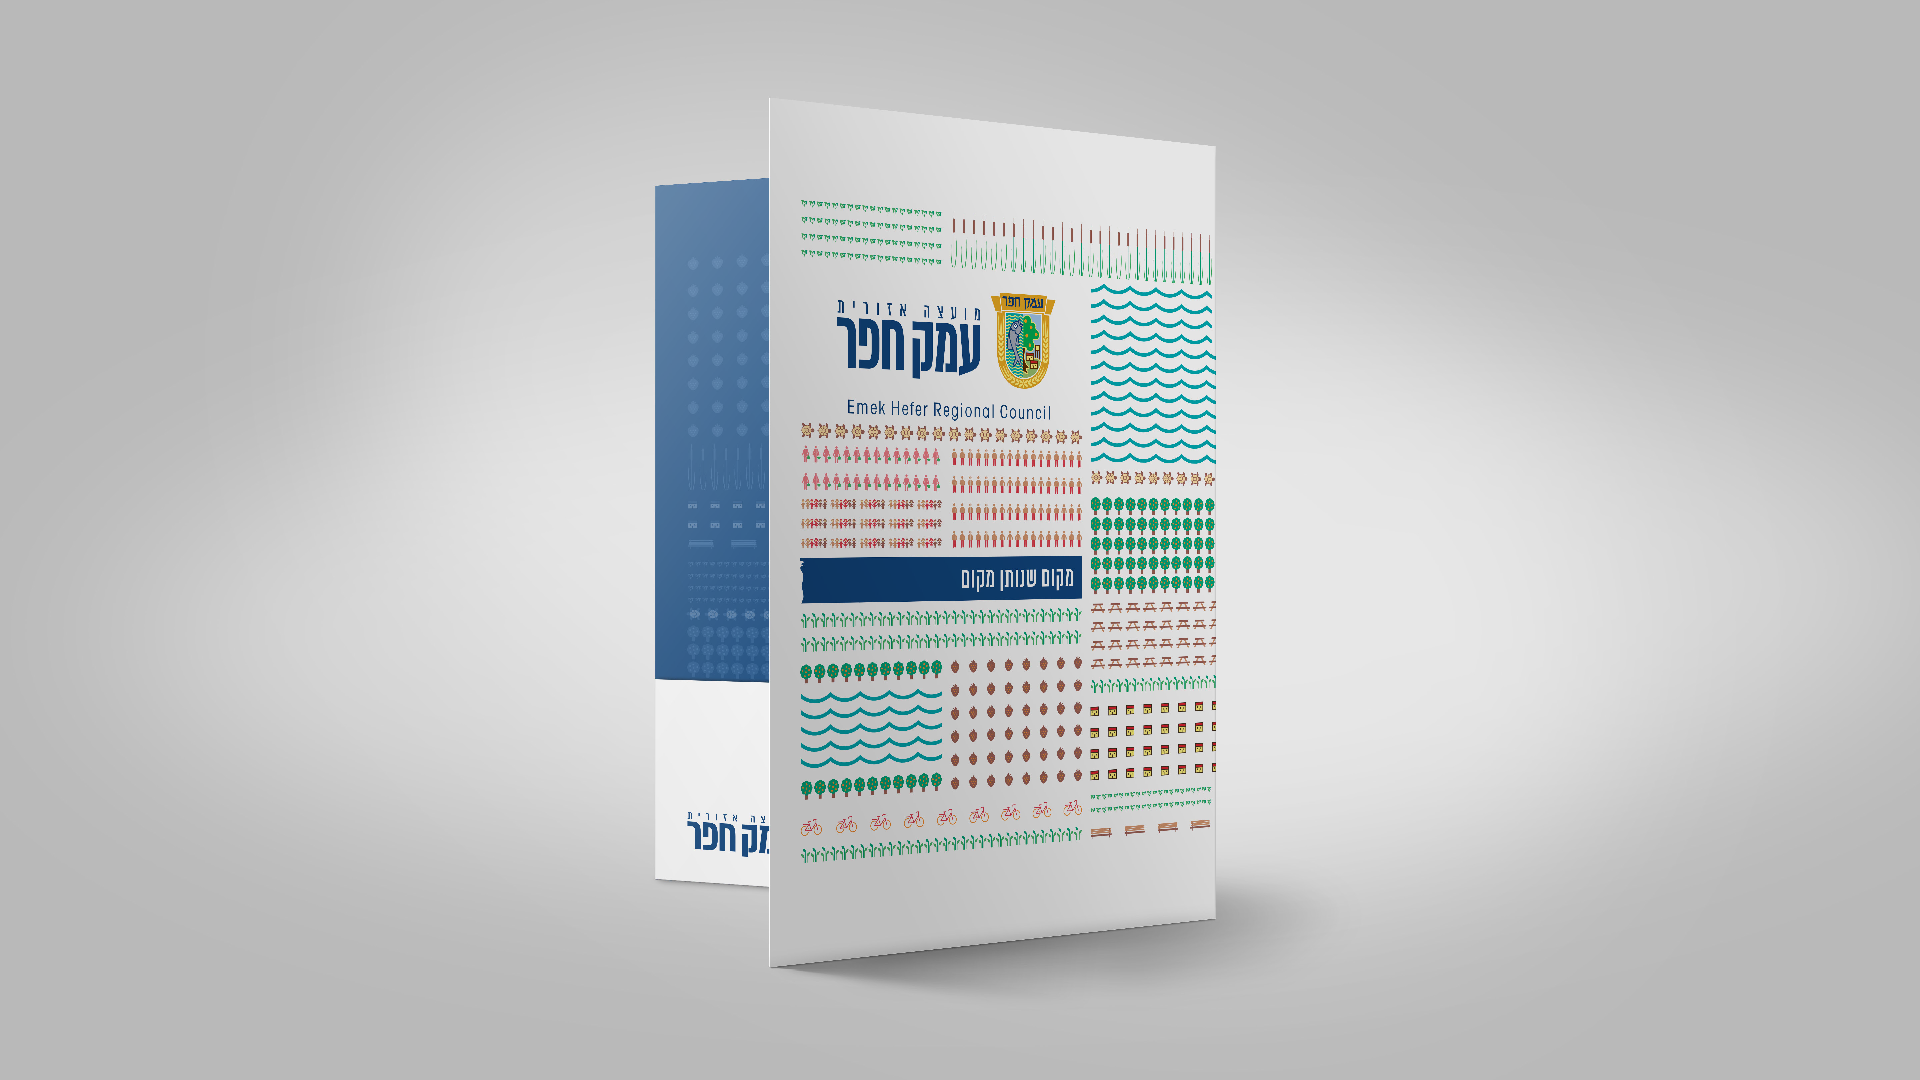 emek hefer slides-9 copy